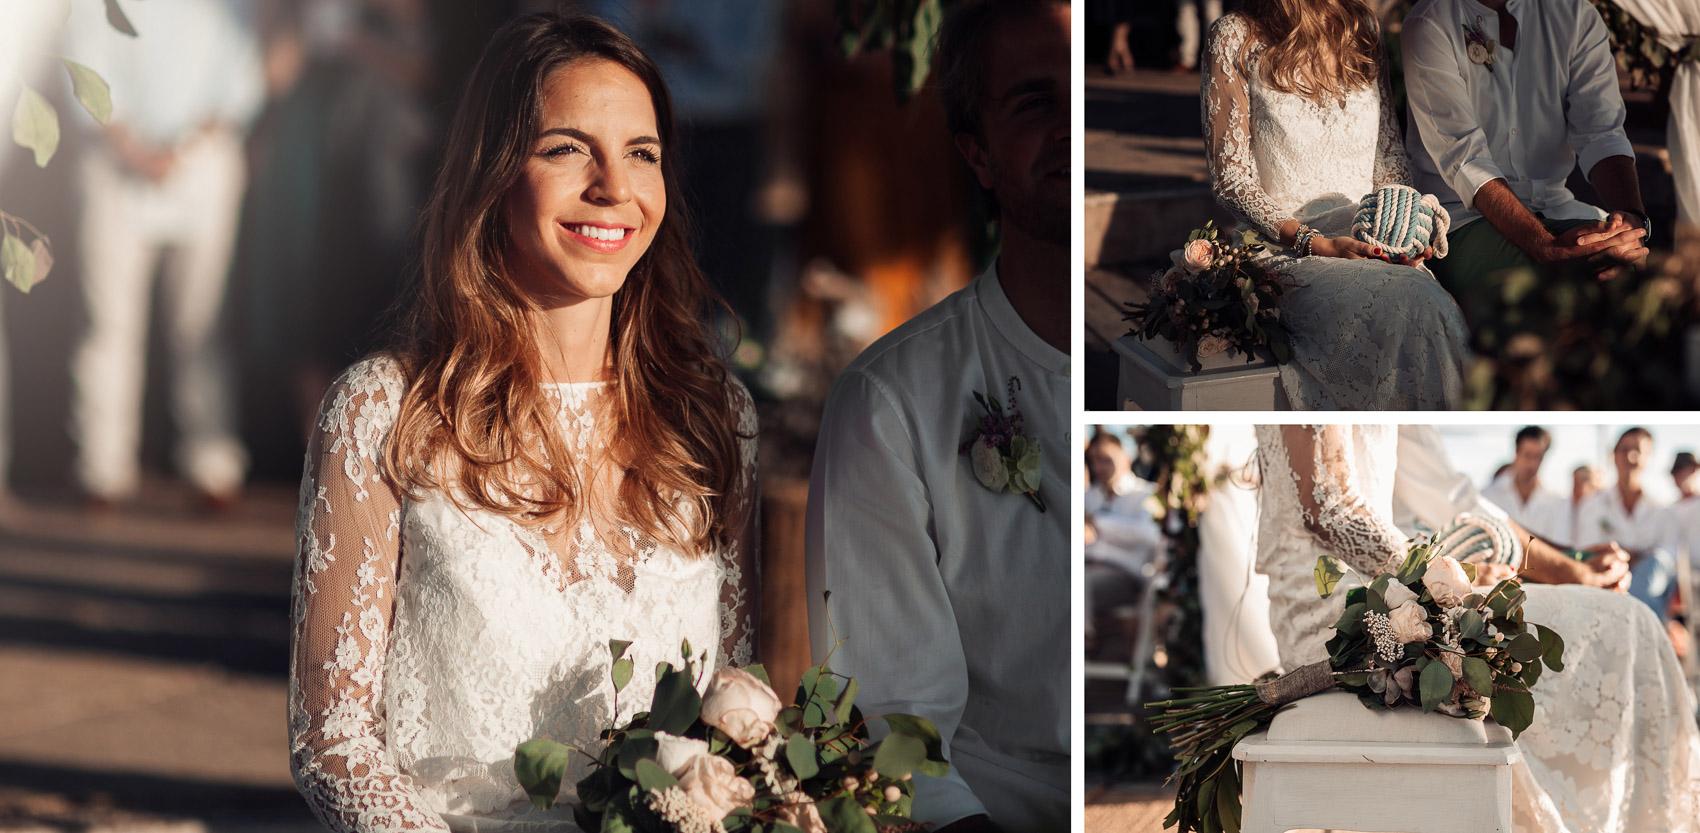 novia vestido blanco encaje ramo flores detalles wedding